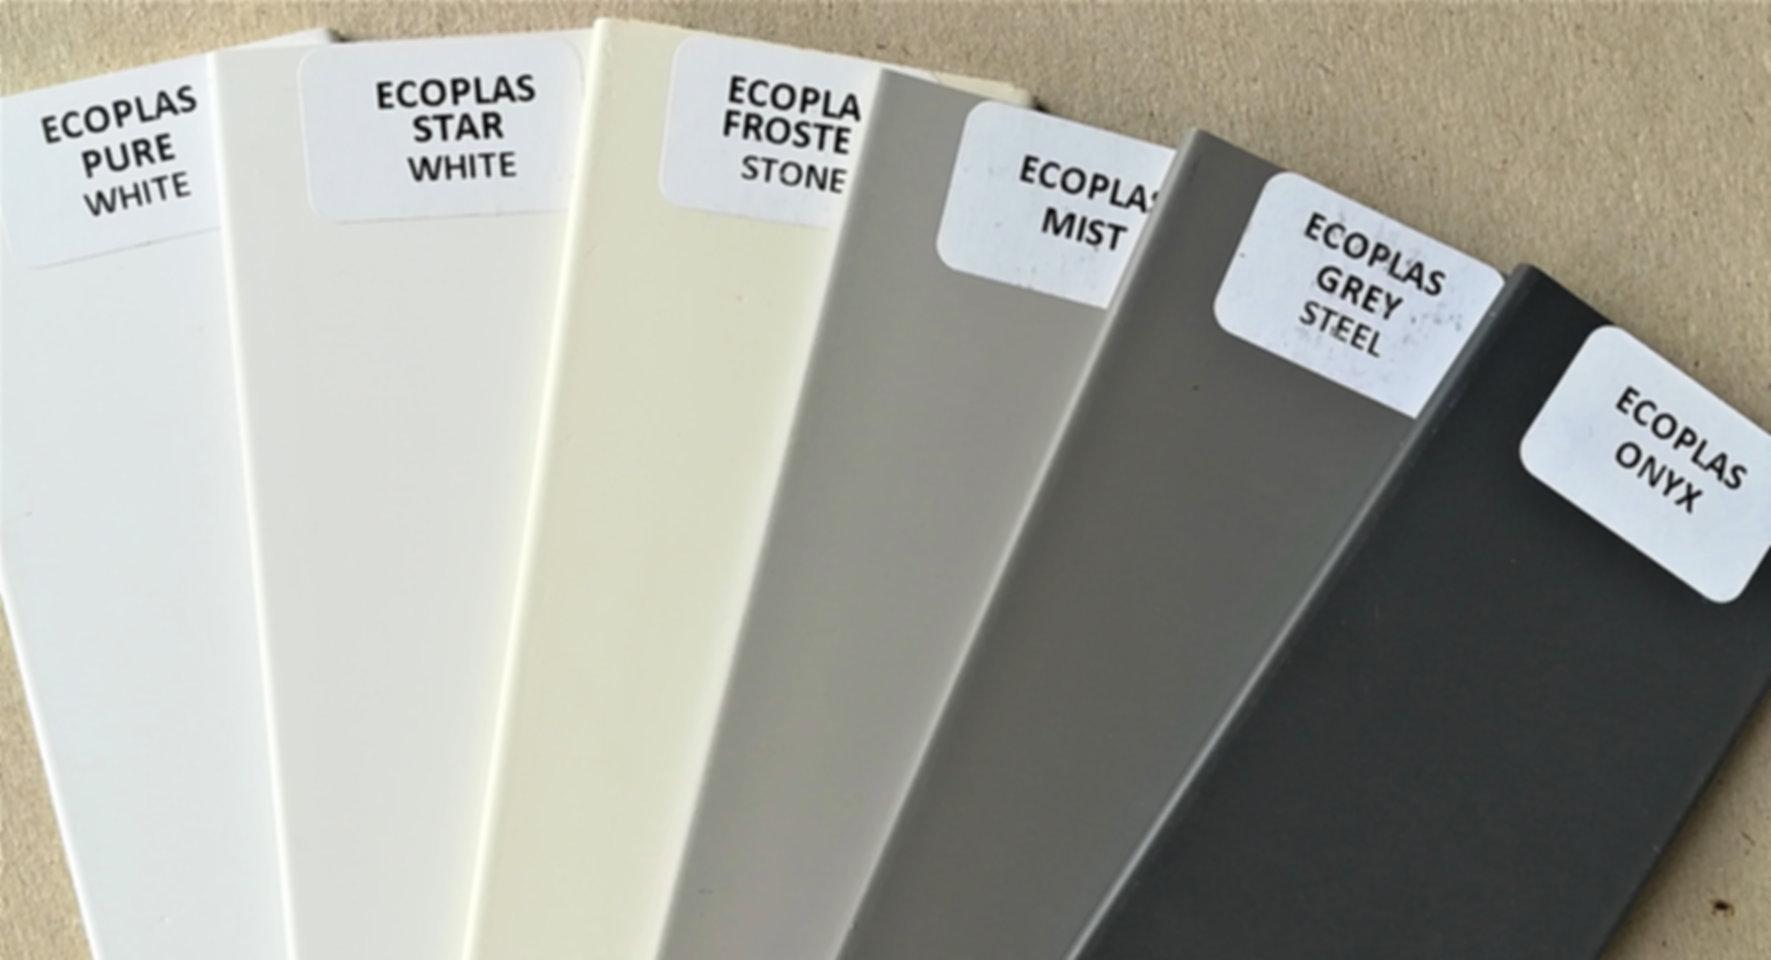 Ecoplas Venetian Blinds.jpg